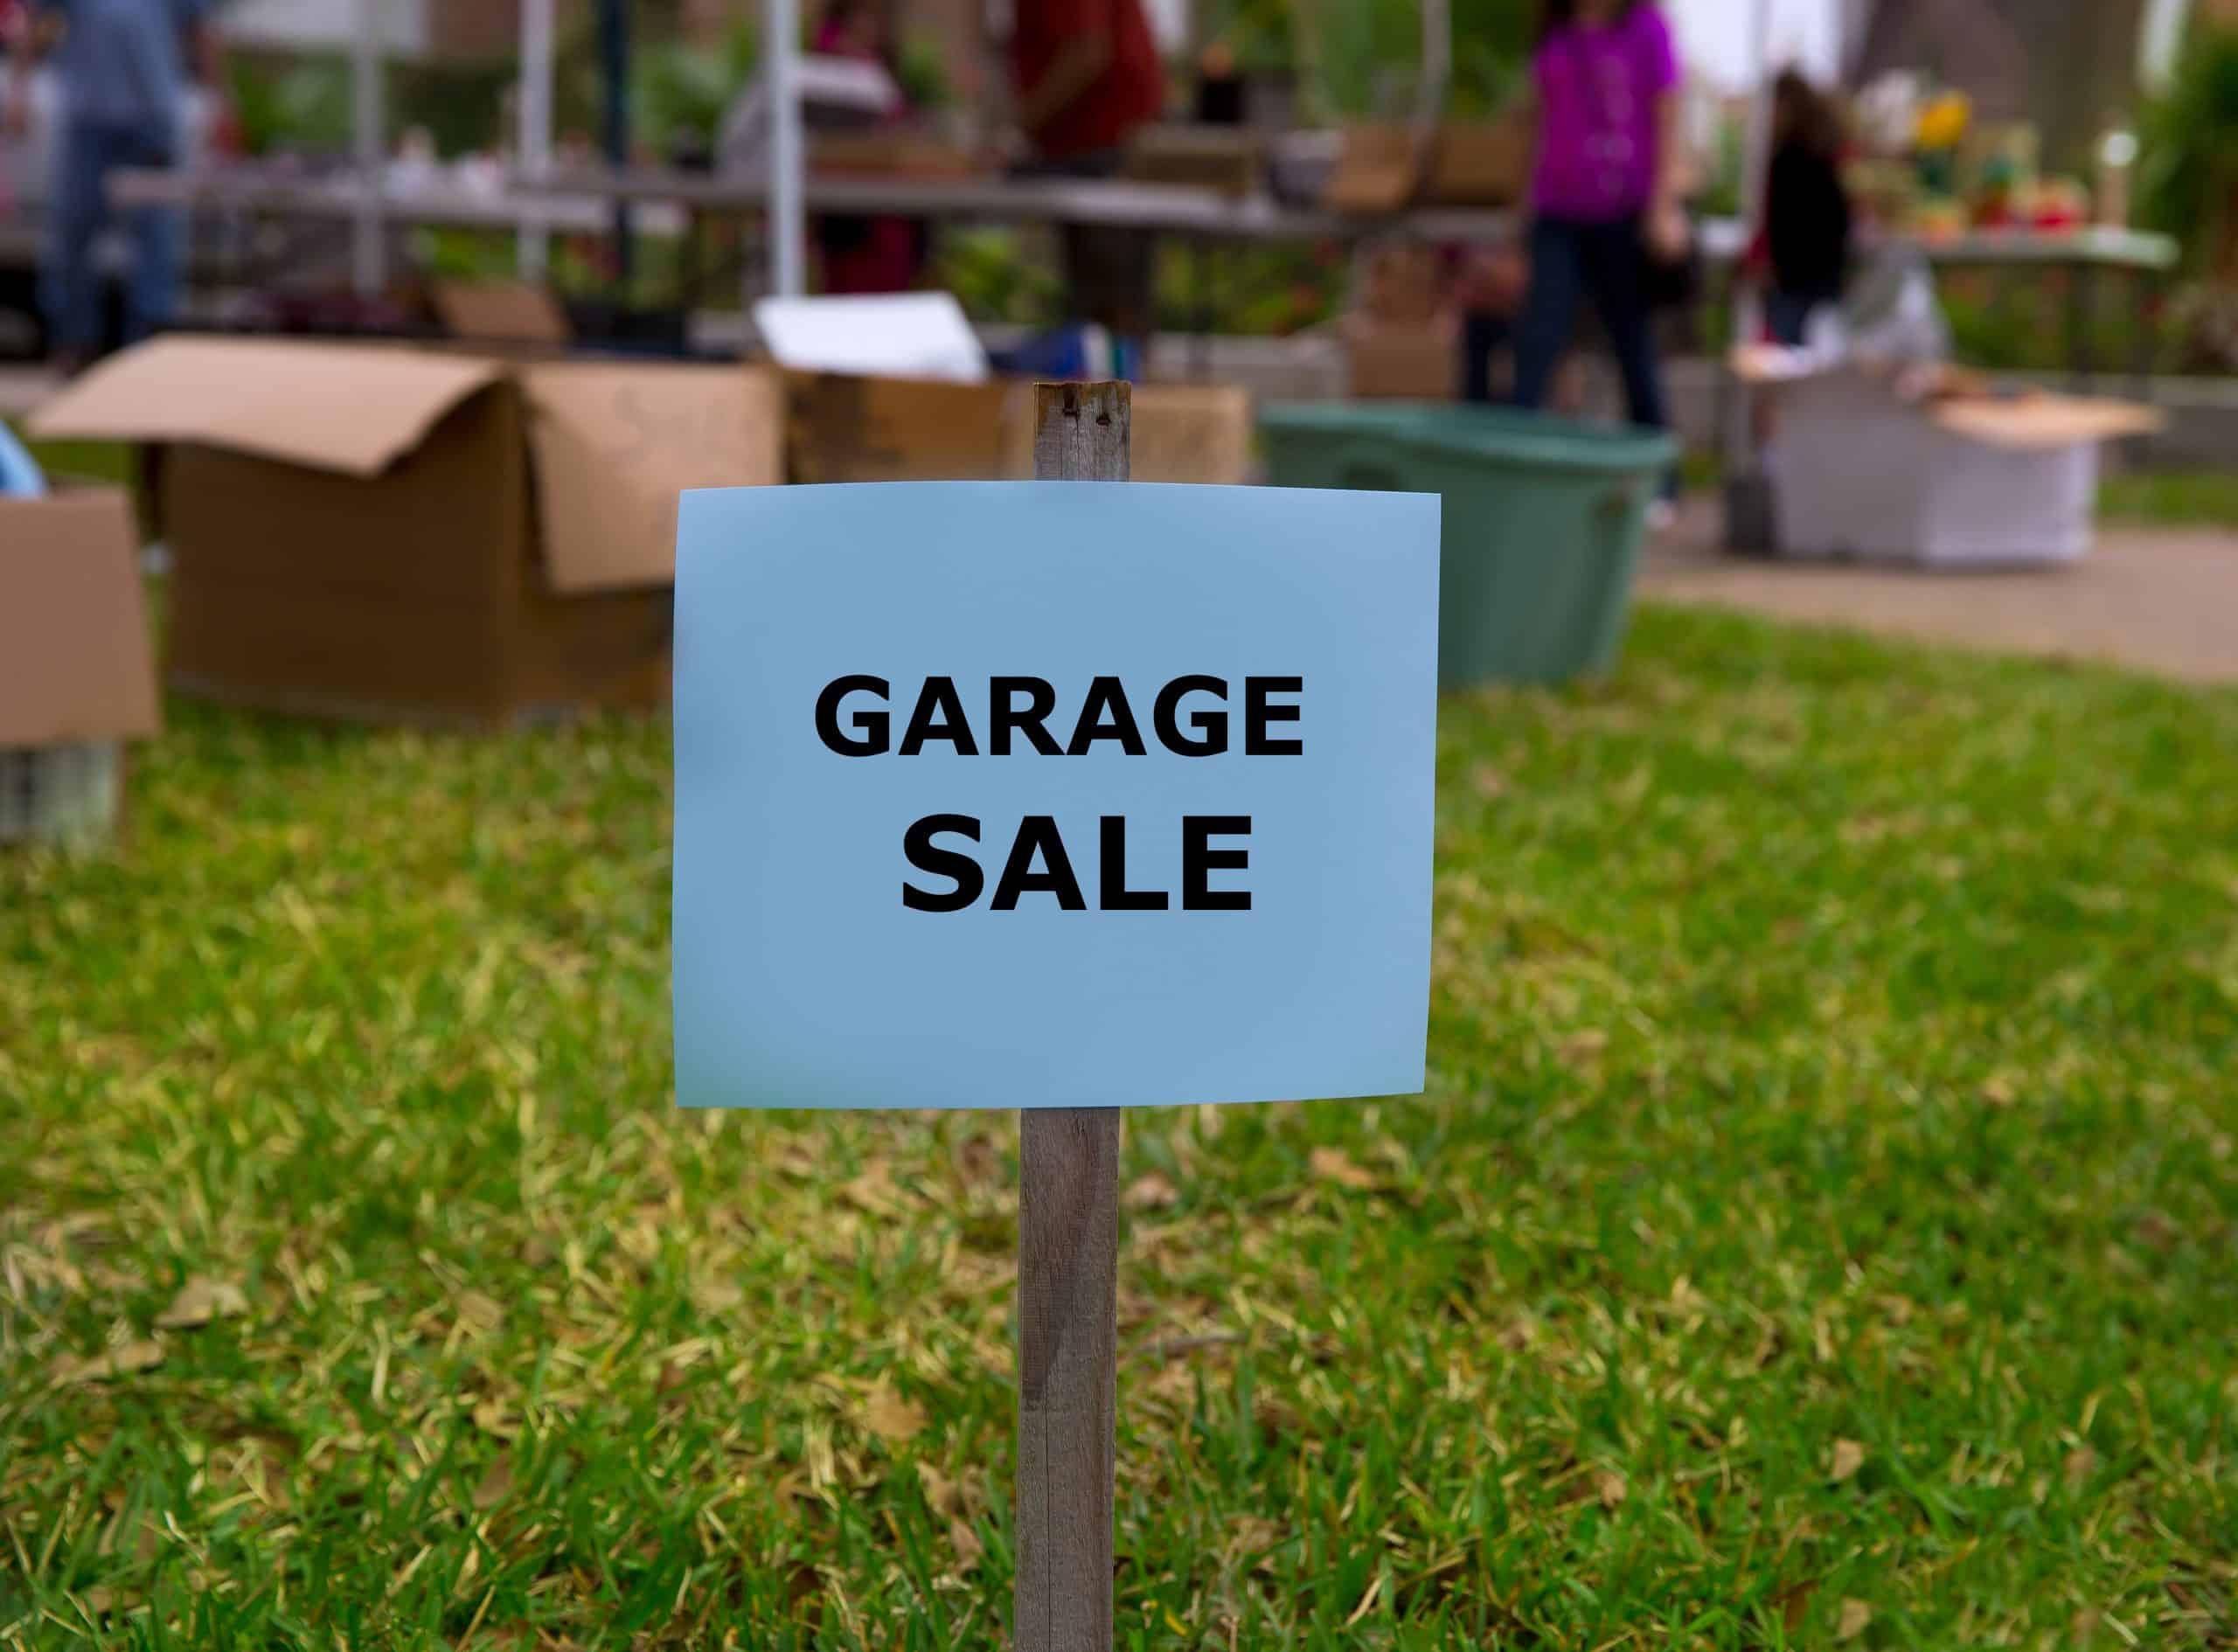 Make money garage sale - Garage sale in an american weekend on the yard green lawn